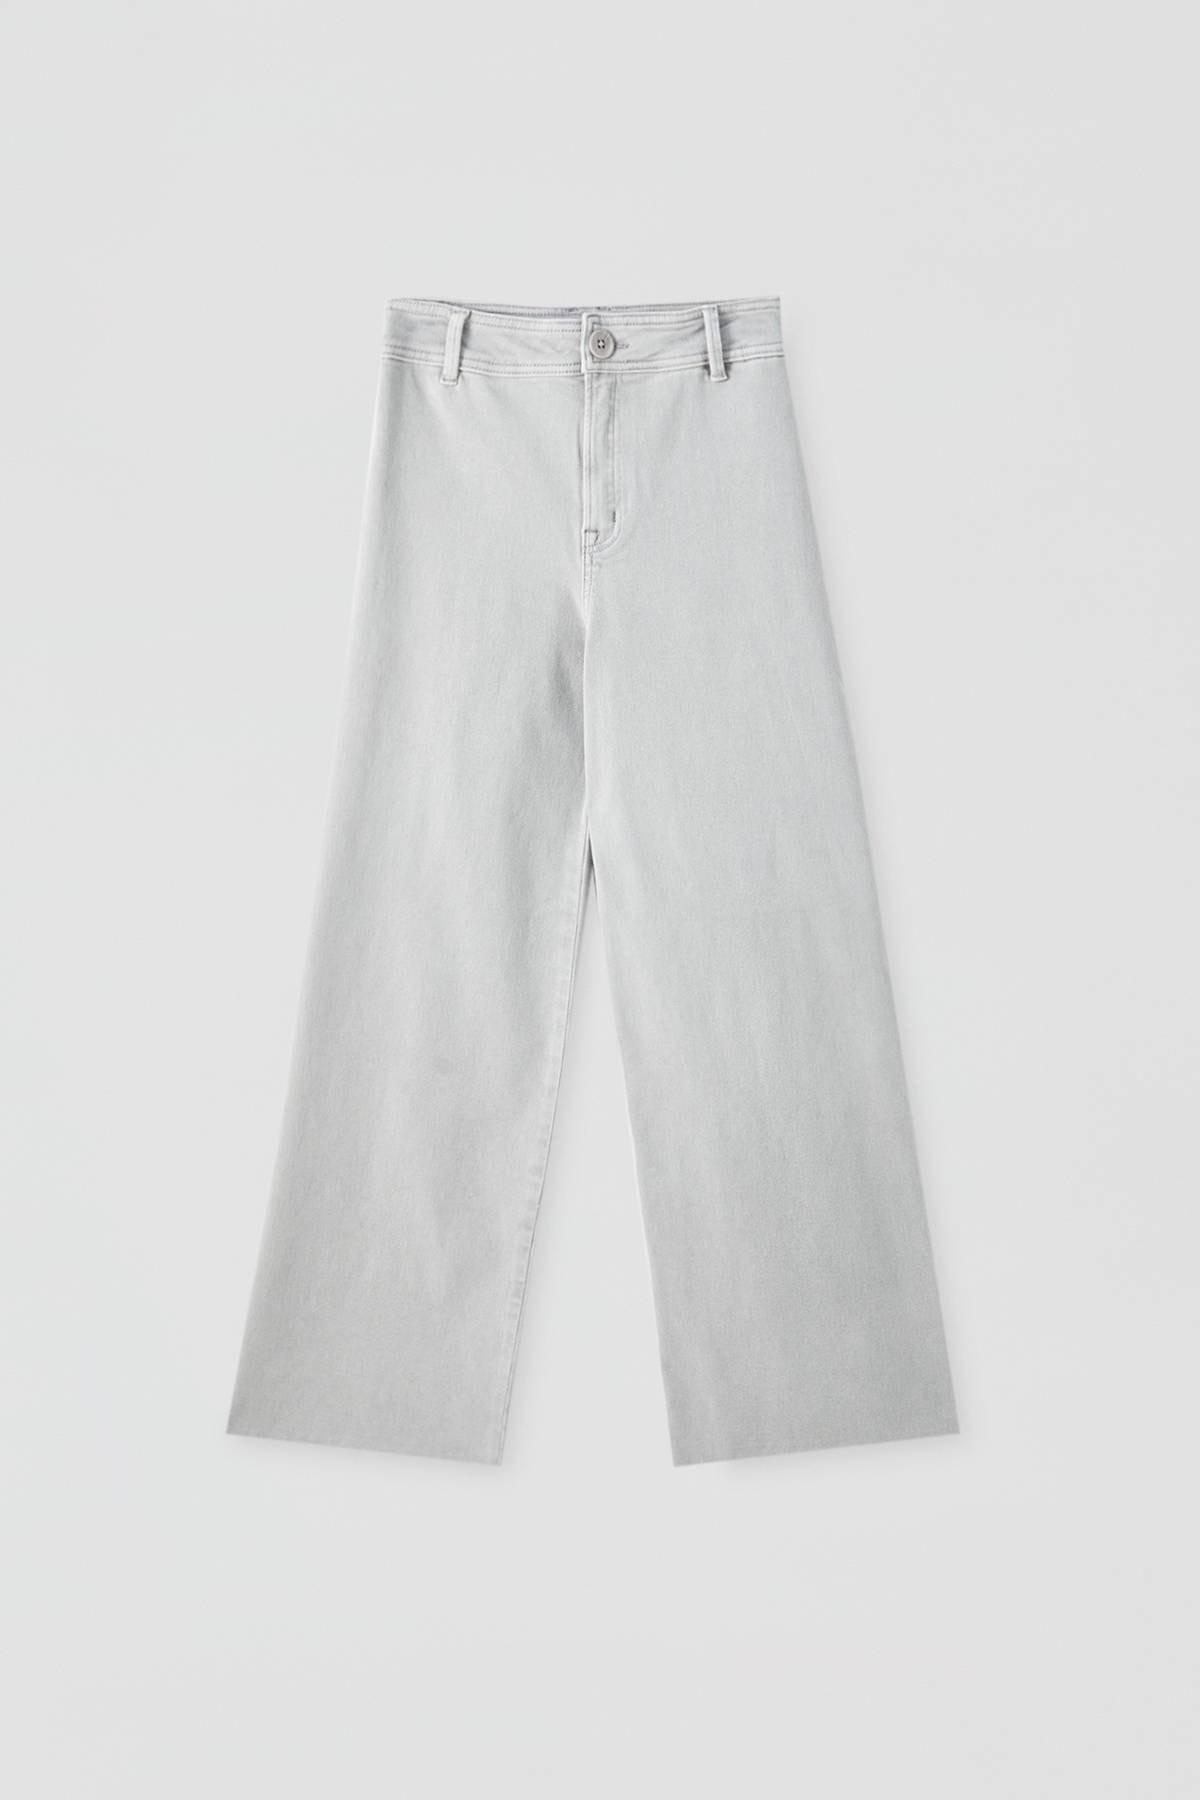 Pull & Bear Kadın Gri Yüksek Bel Crop Fit Pantolon. 09678302 2